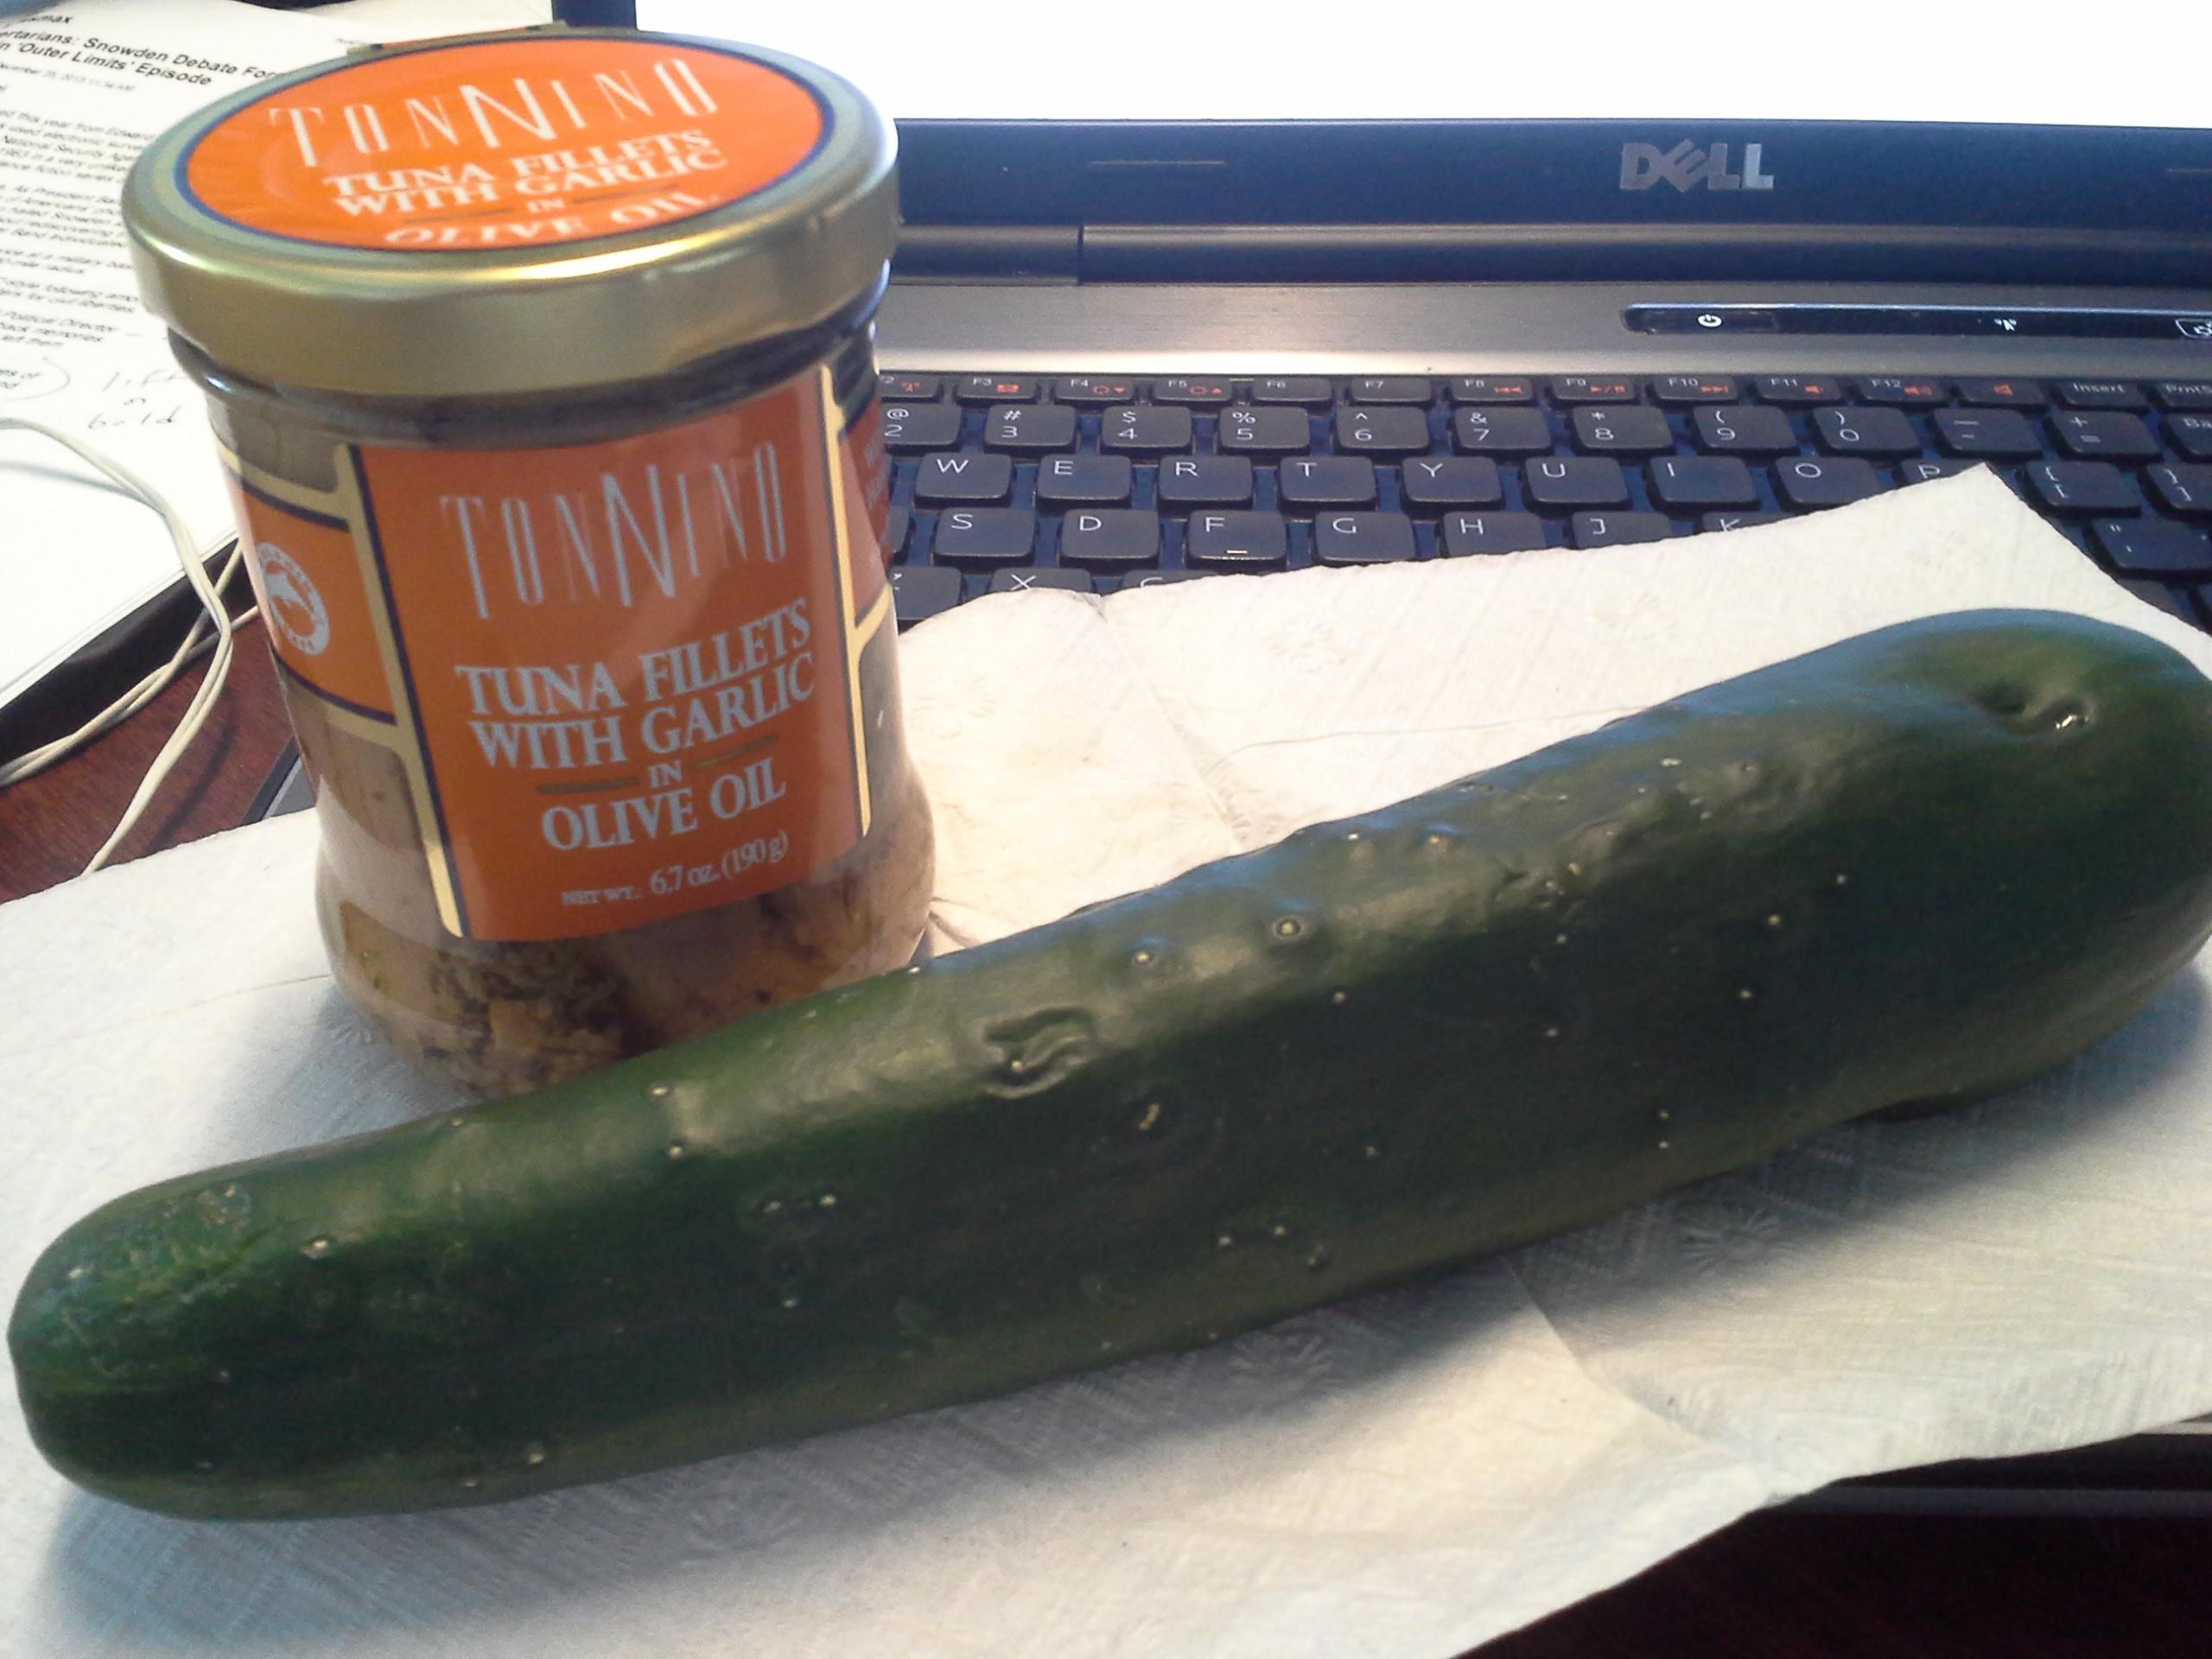 Lunch: 2:25 p.m. | 6.7 oz. tuna filets with garlic in olive oil, 1 cucumber